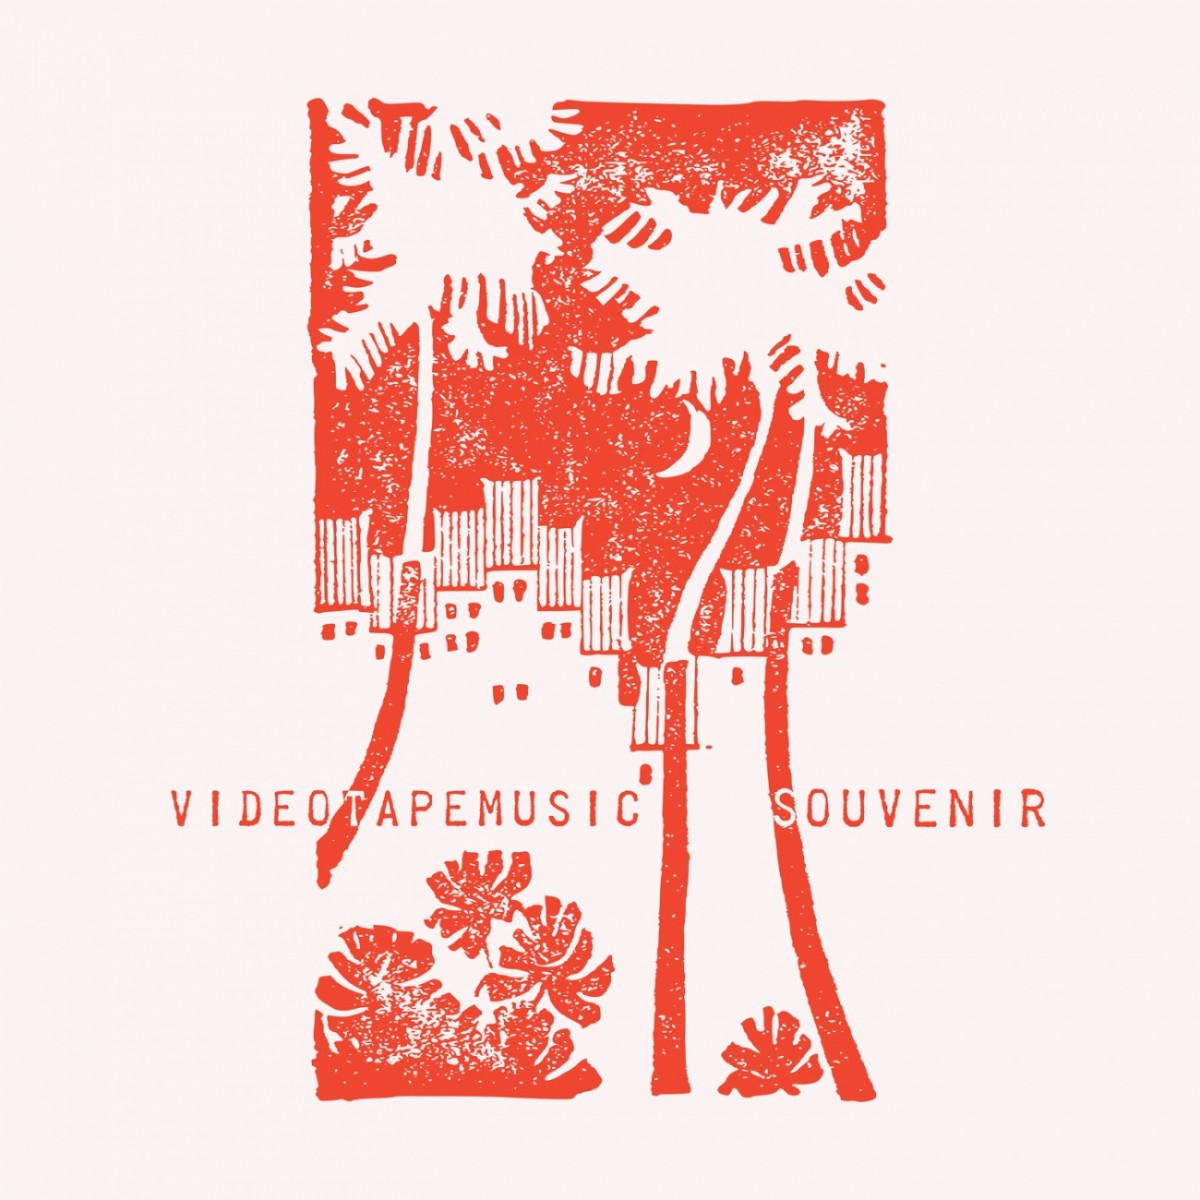 Souvenir - Videotapemusic